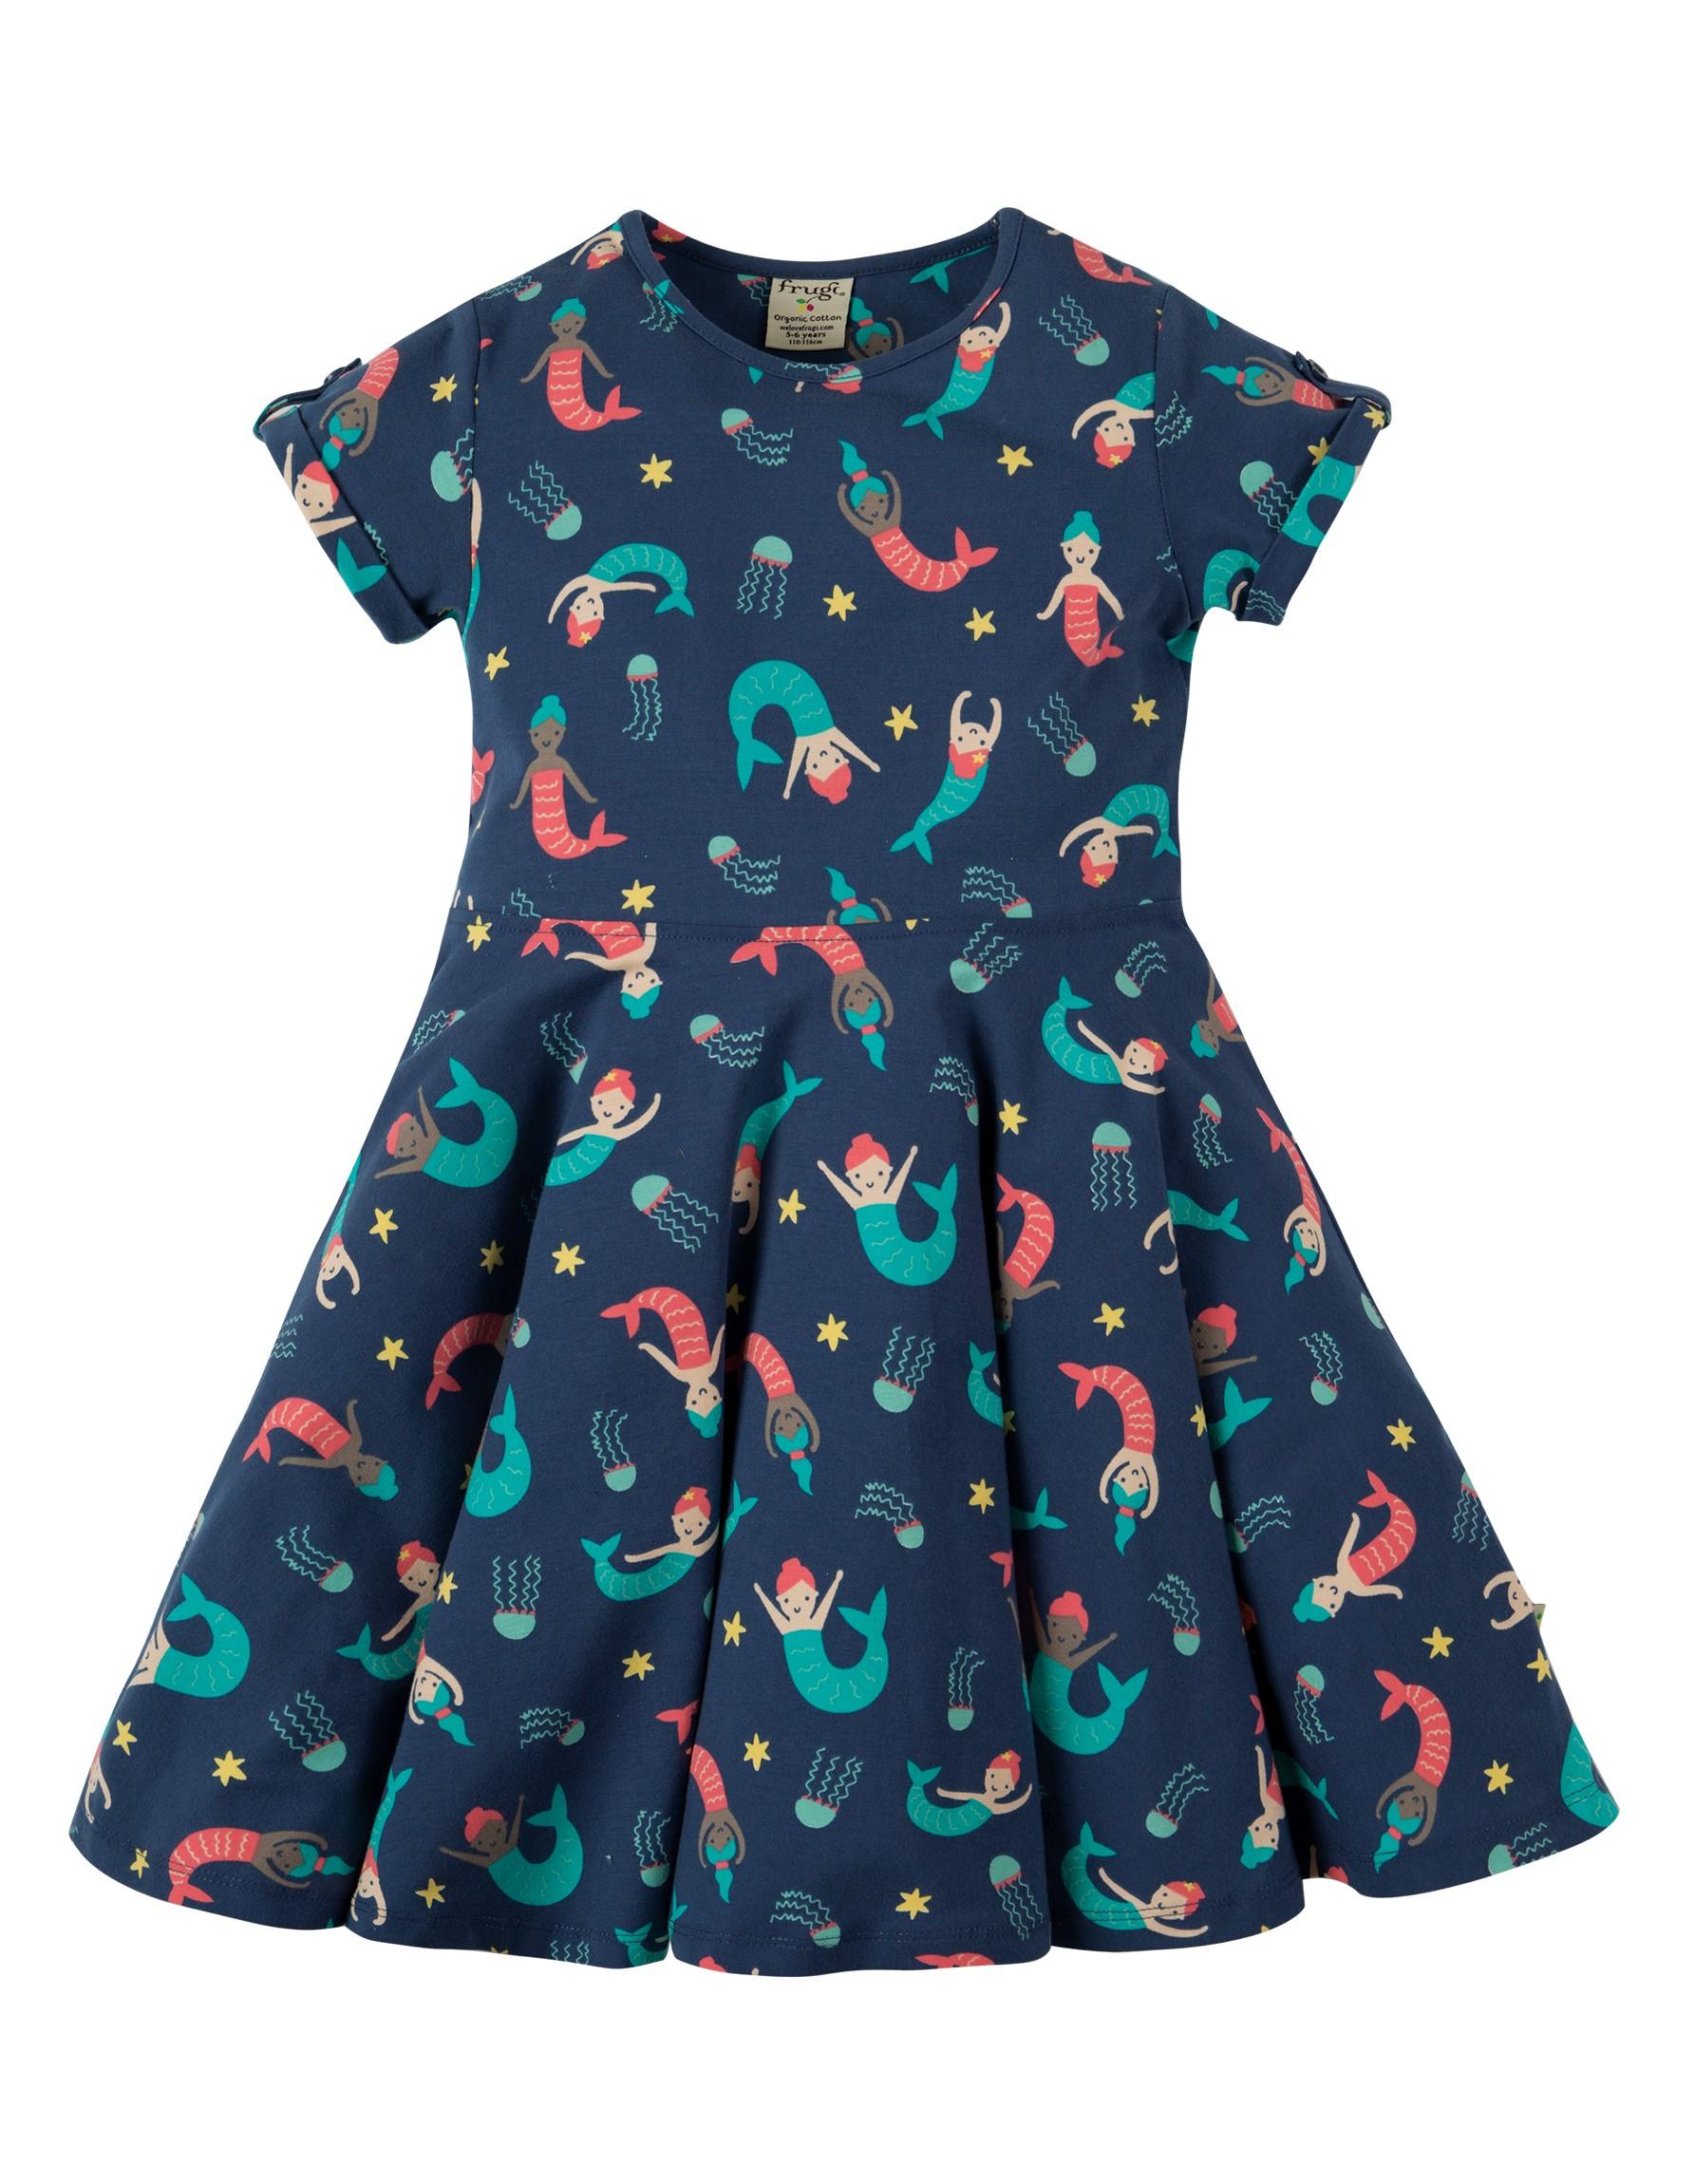 robe spring skater dress marine blue mermaid magic coton bio